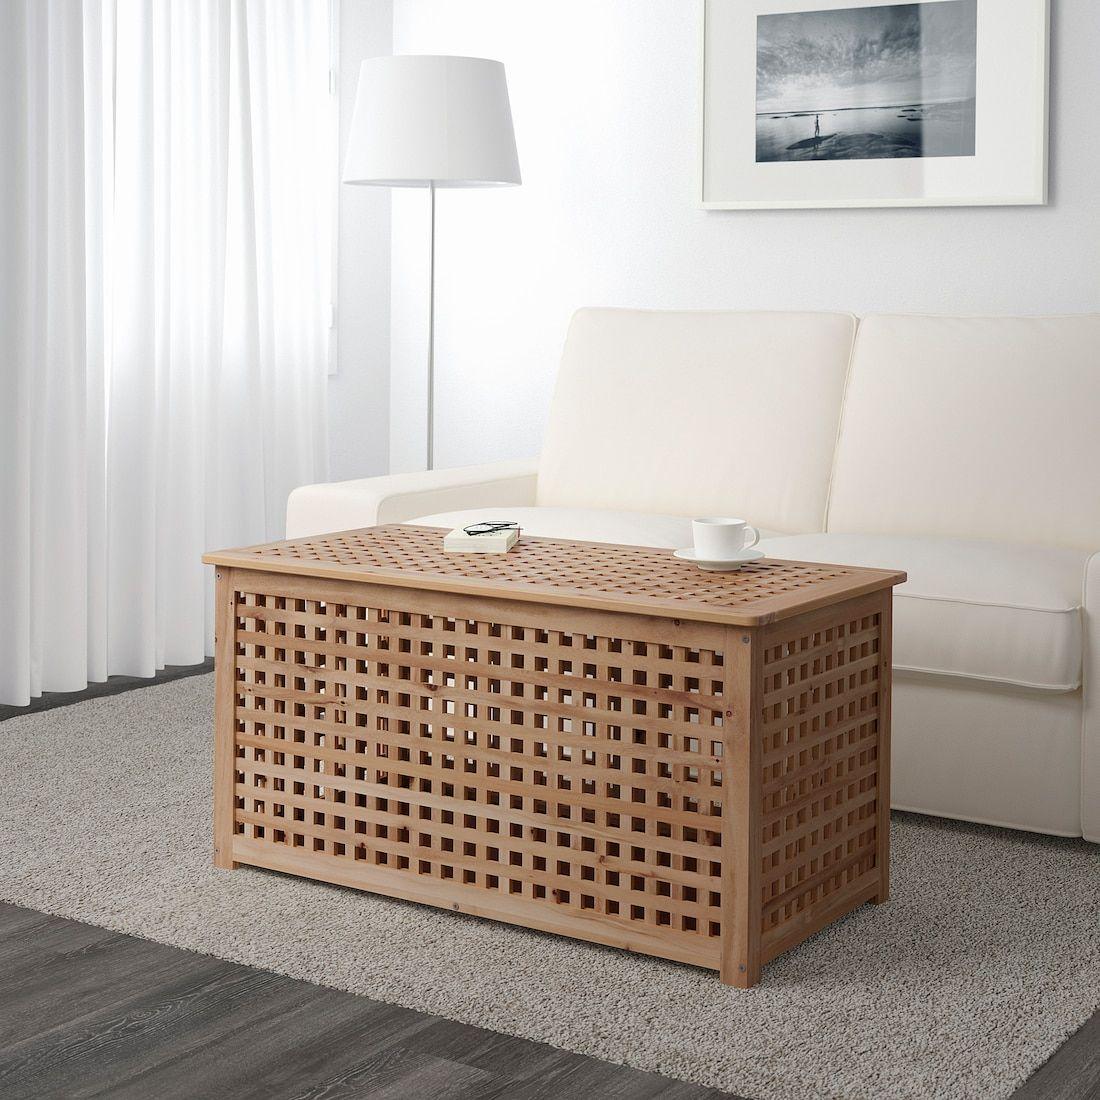 Hol Stol Sunduk Akaciya 98x50 Sm Kupit V Internet Magazine Ikea In 2021 Table Storage Ikea Solid Wood Ikea [ 1100 x 1100 Pixel ]